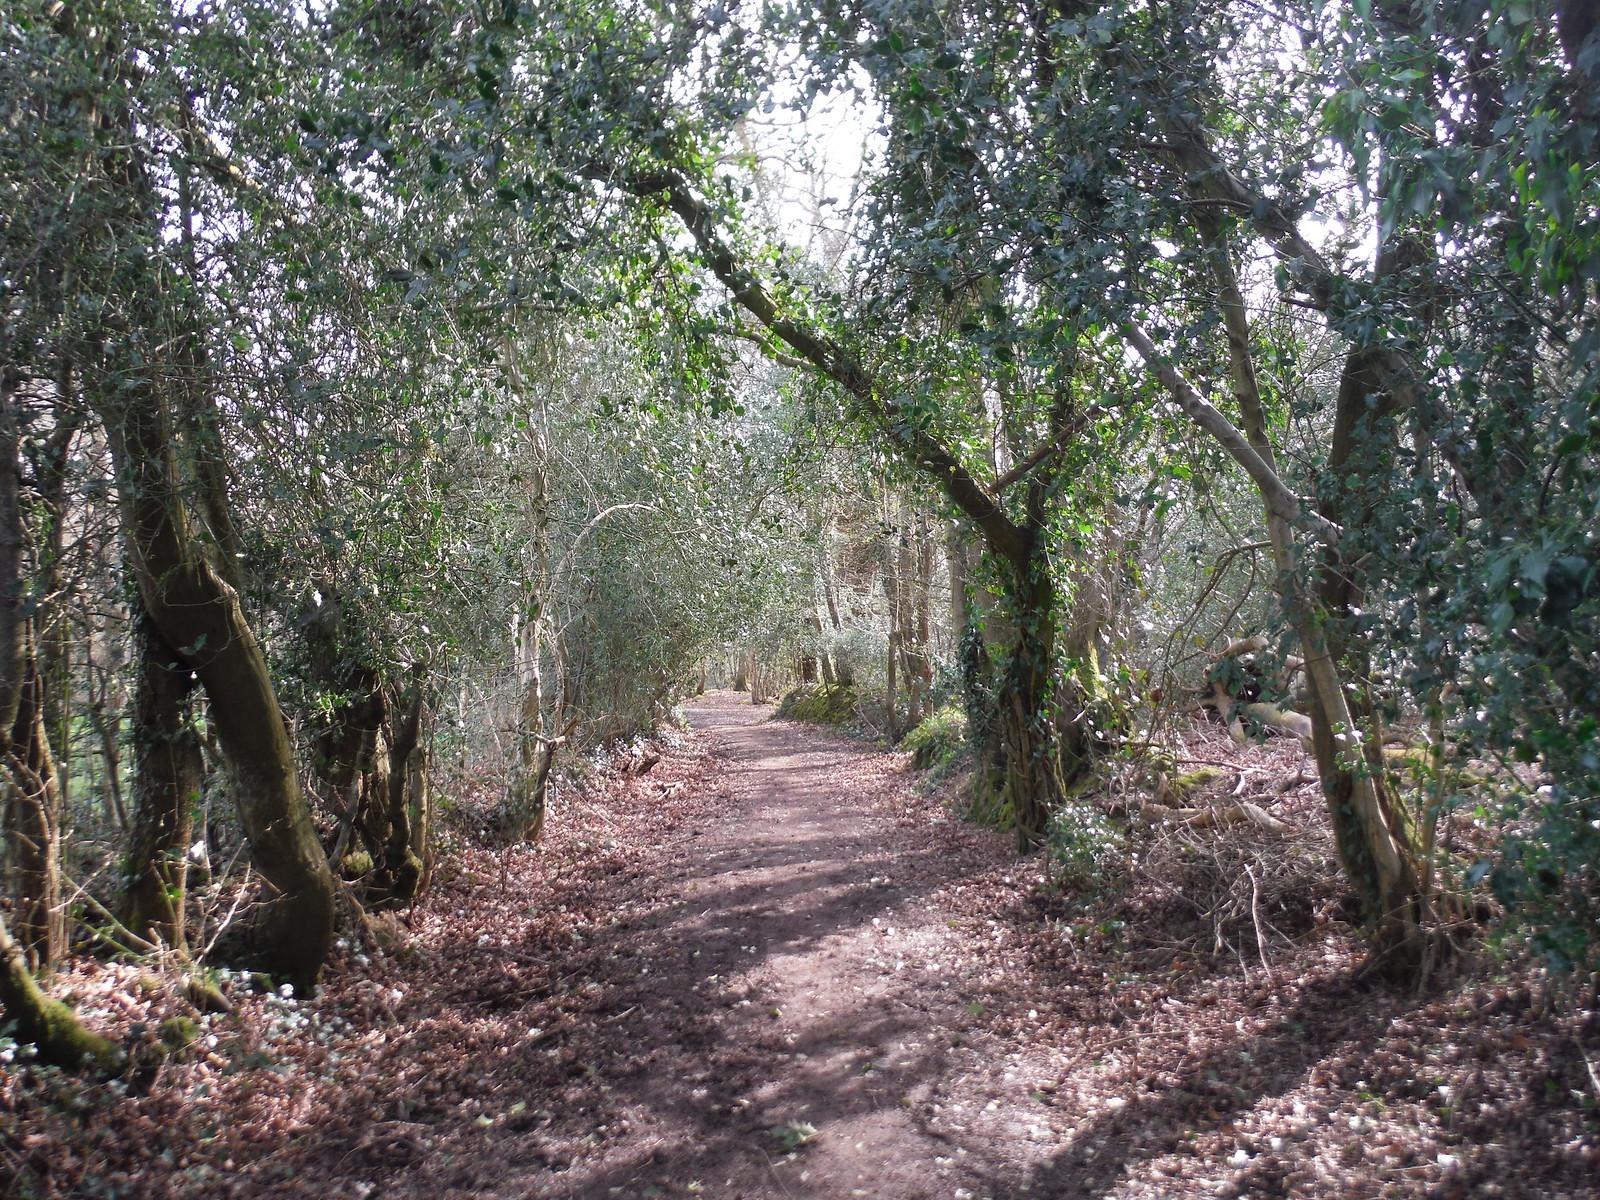 Sandpits Wood, Horsted Keynes SWC Walk 27 - East Grinstead to Wivelsfield or Sheffield Park